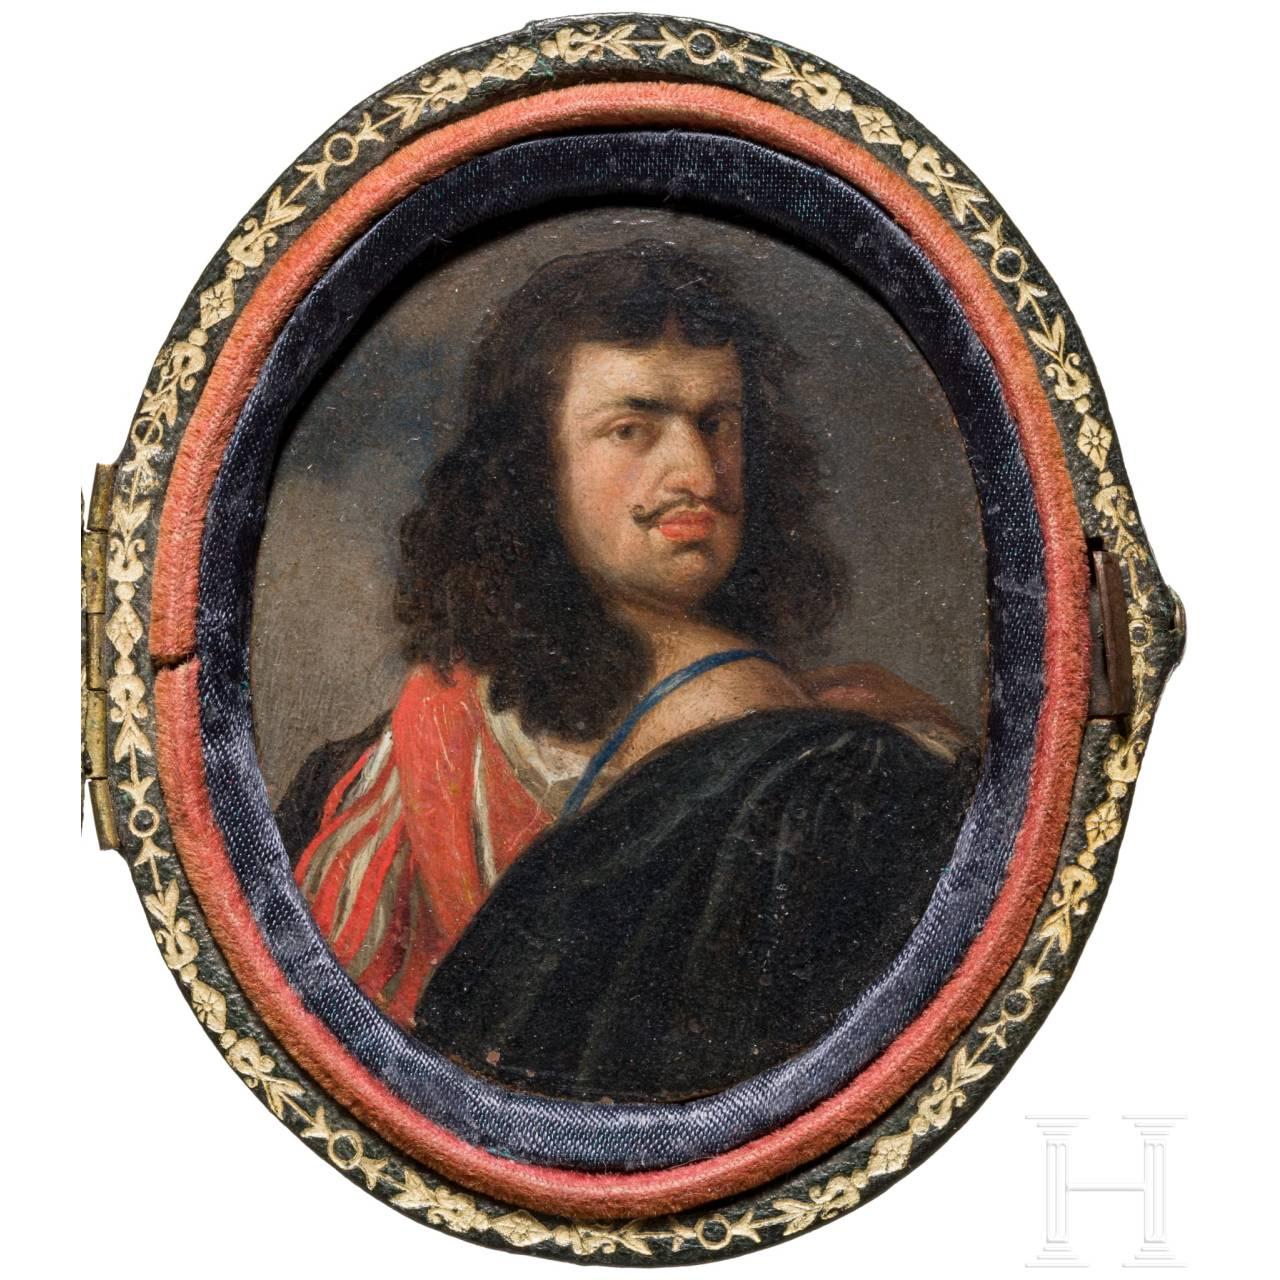 Gonzales Coques (Antwerpen 1614 - 1684), Miniaturmalerei, wohl Portrait des Malers Van Dyke